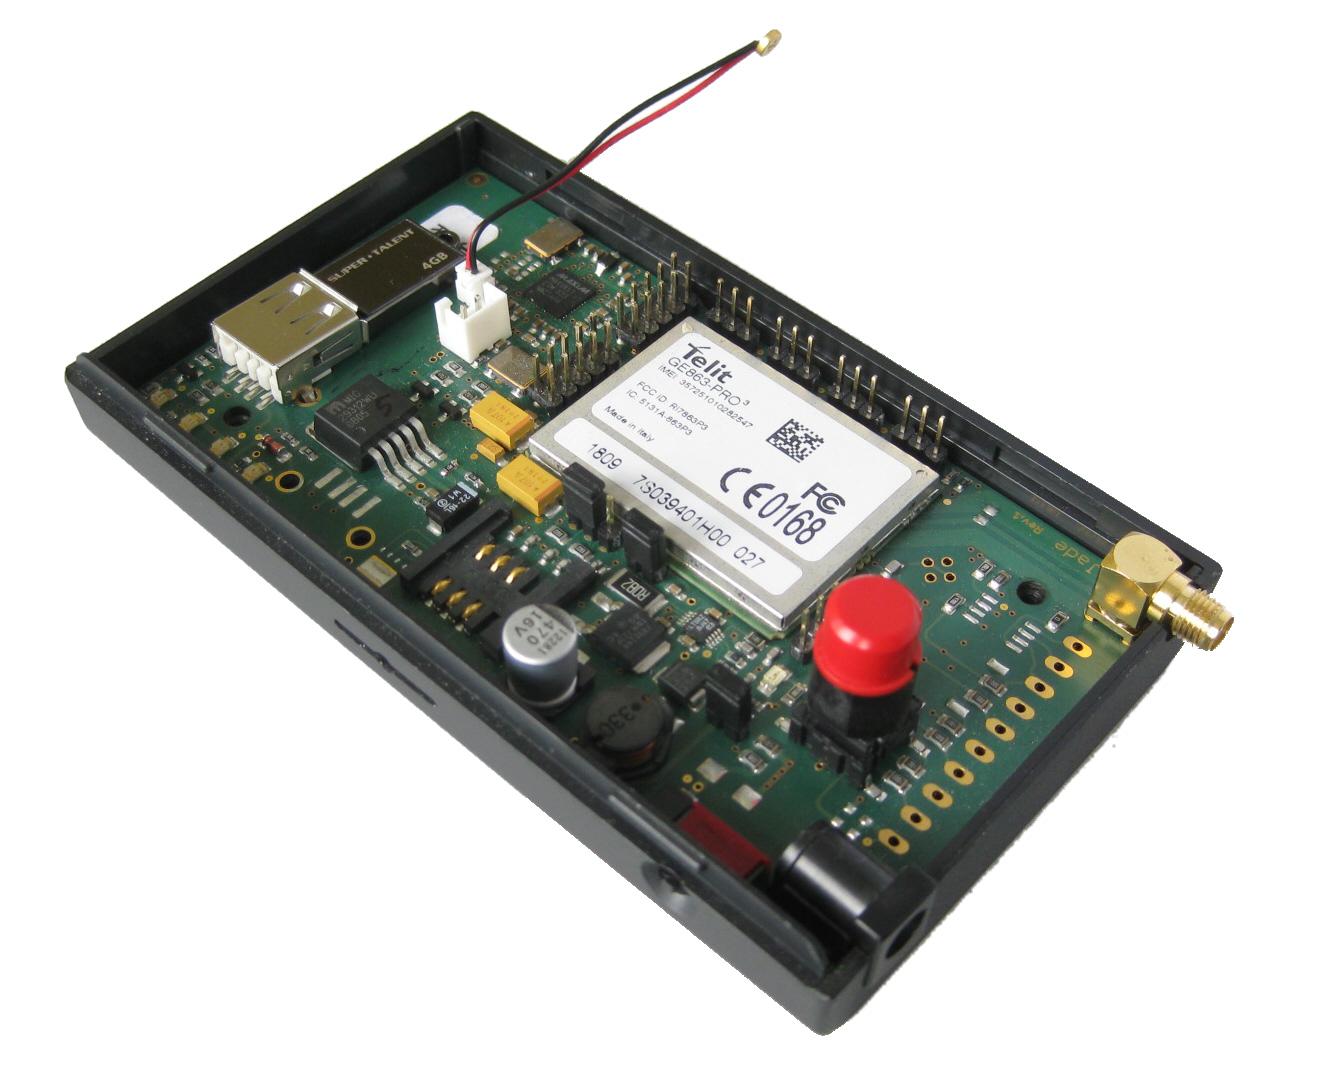 http://www.gsm-modem.de/M2M/wp-content/uploads/2010/09/Single-PC-with-GPRS-module.jpg